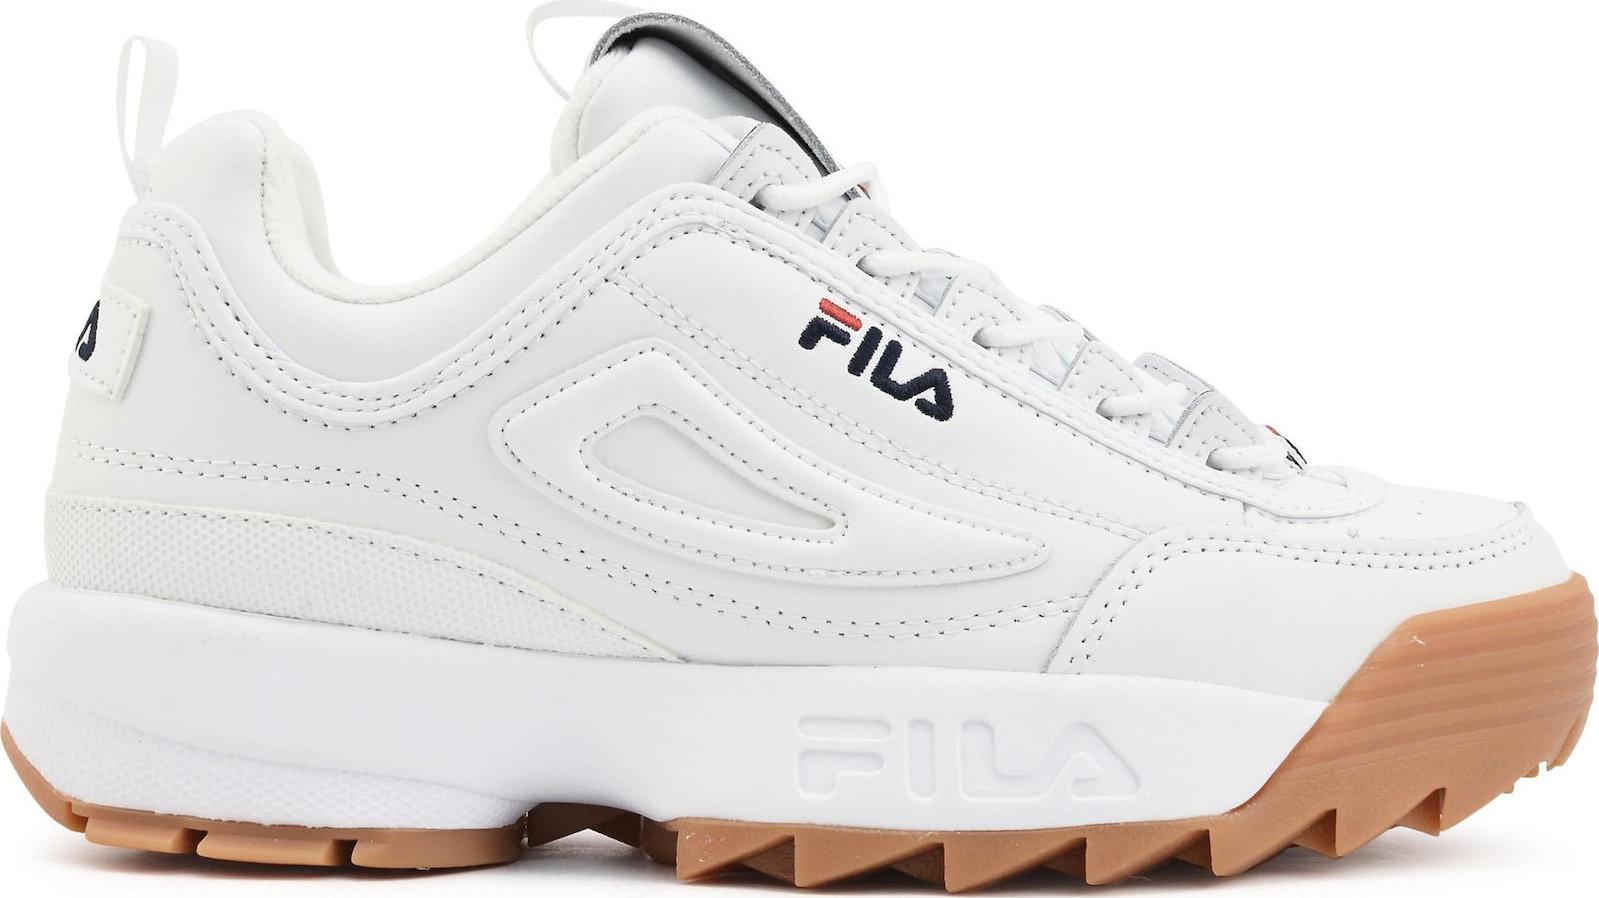 df68cc4e7bb Προσθήκη στα αγαπημένα menu Fila Disruptor II Premium Sneaker